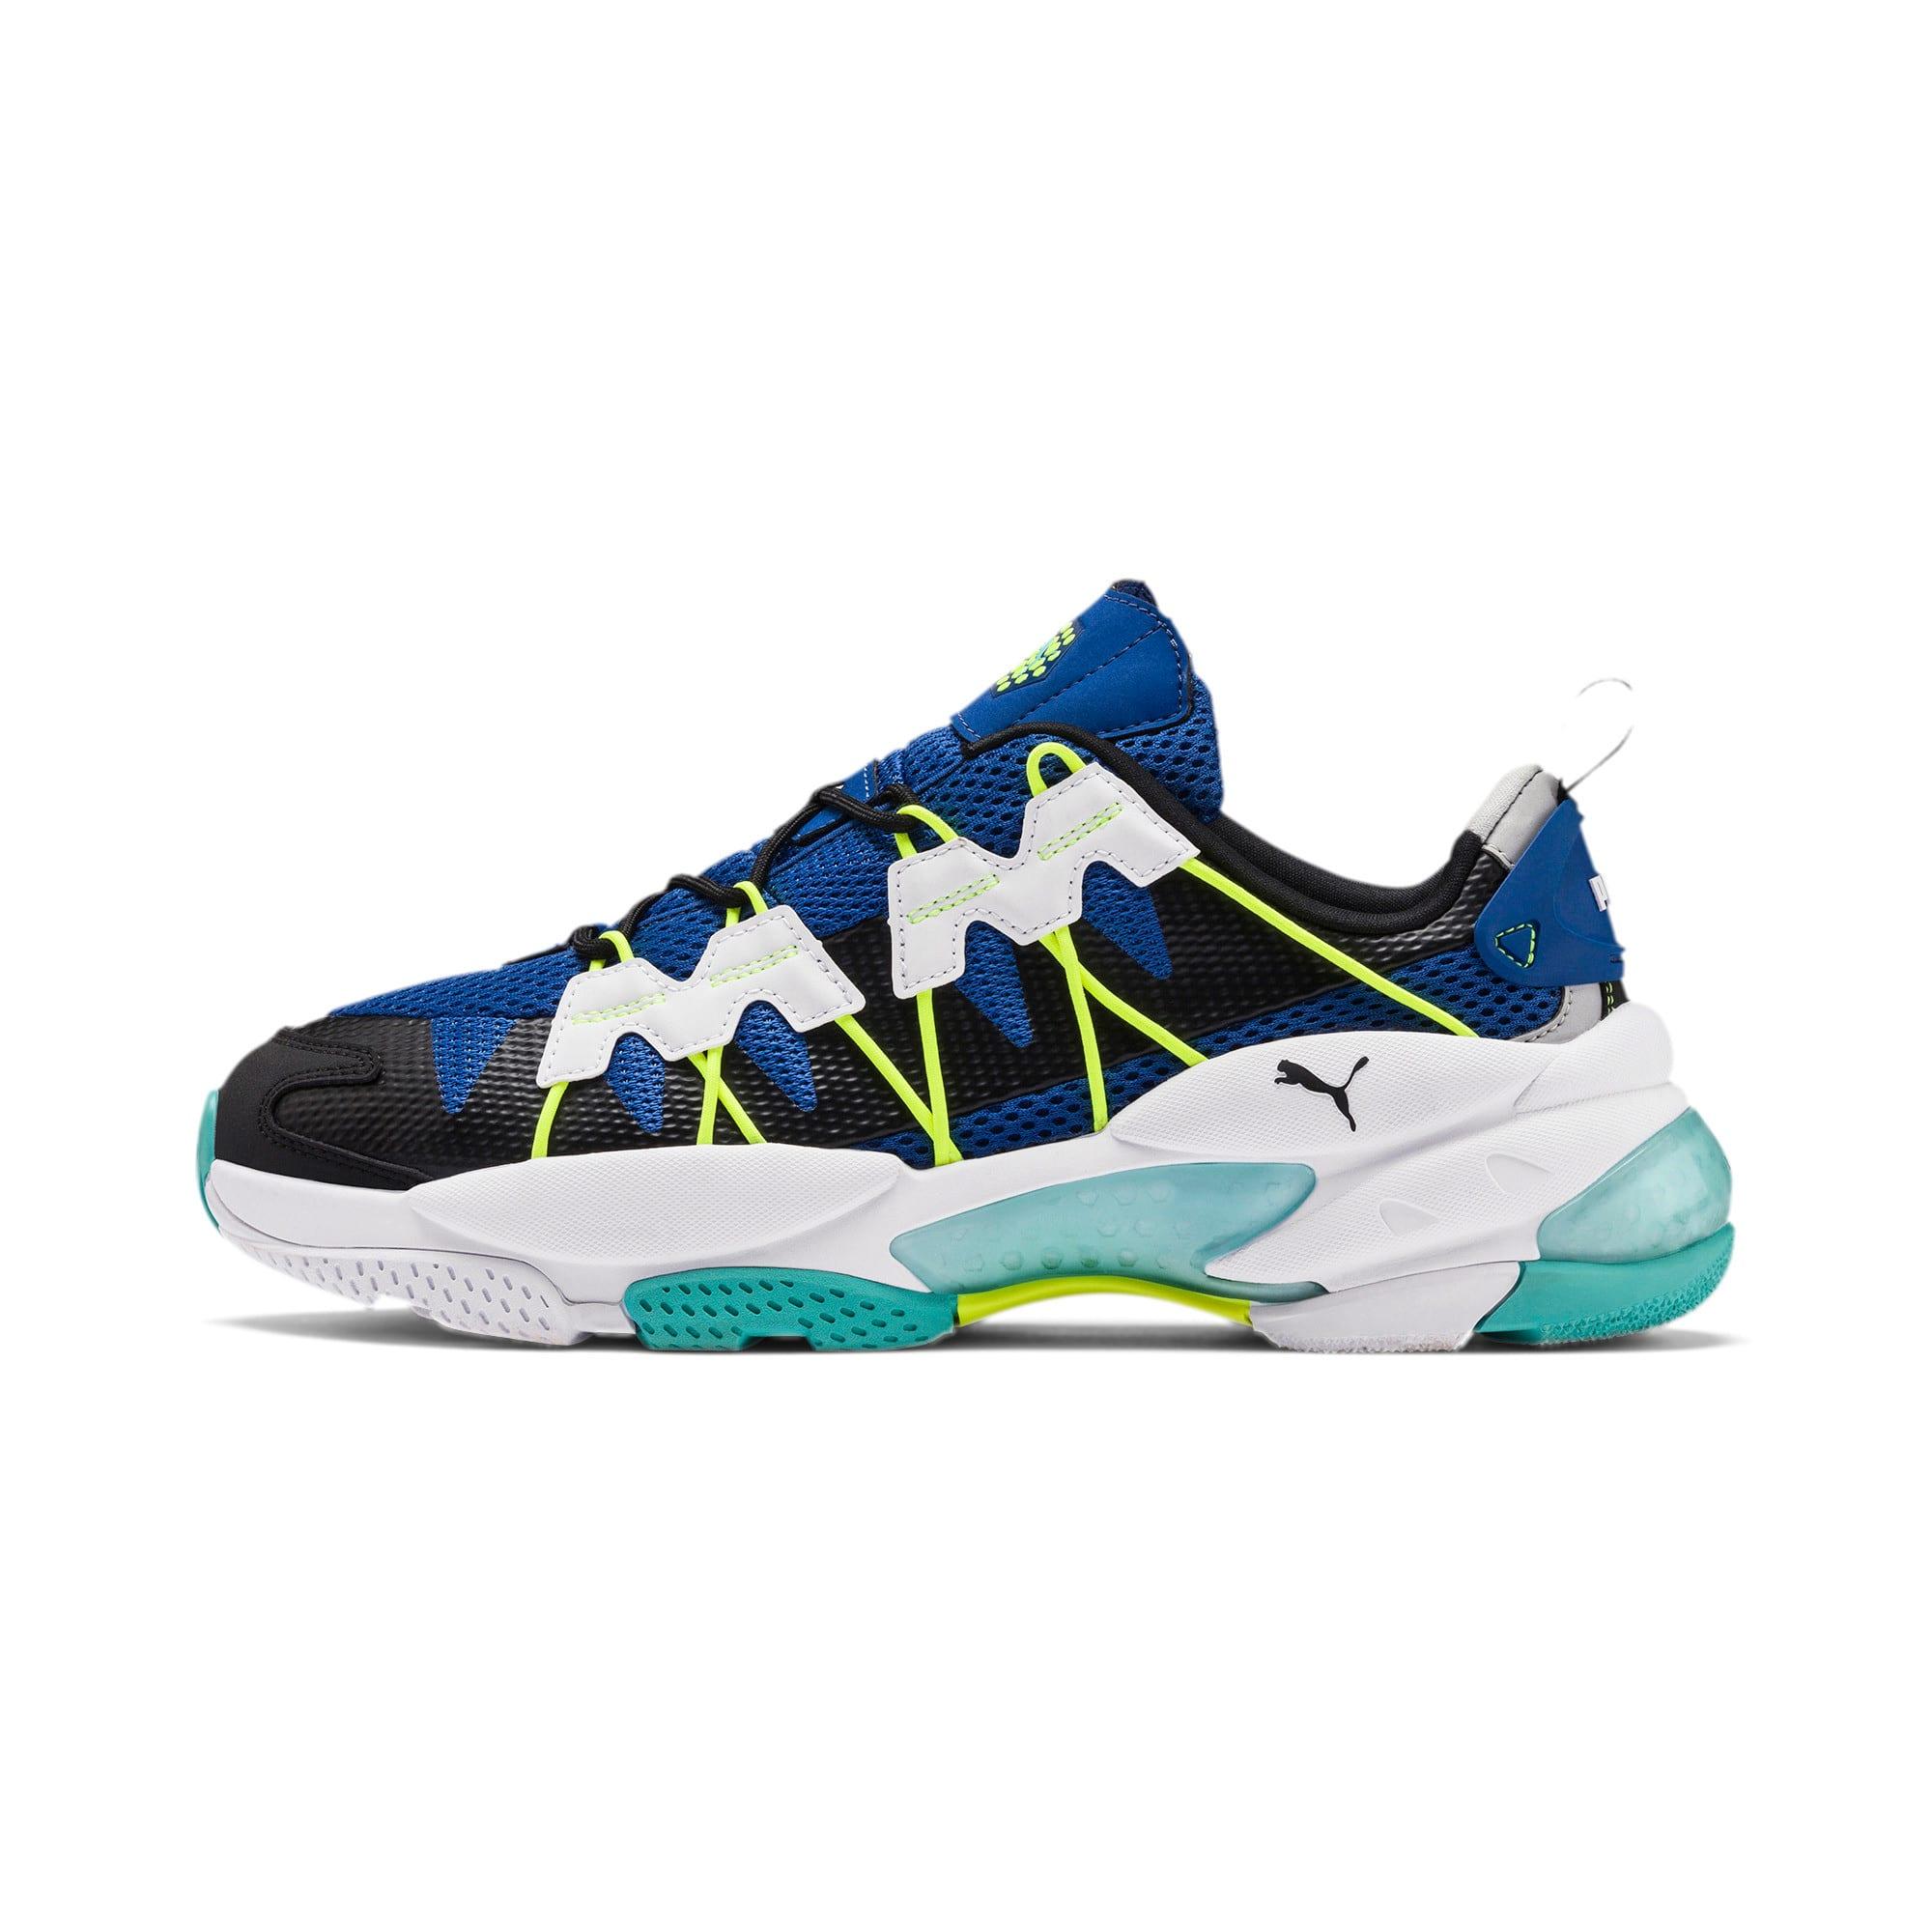 Thumbnail 1 of LQDCELL Omega Training Shoes, Puma Black-Galaxy Blue, medium